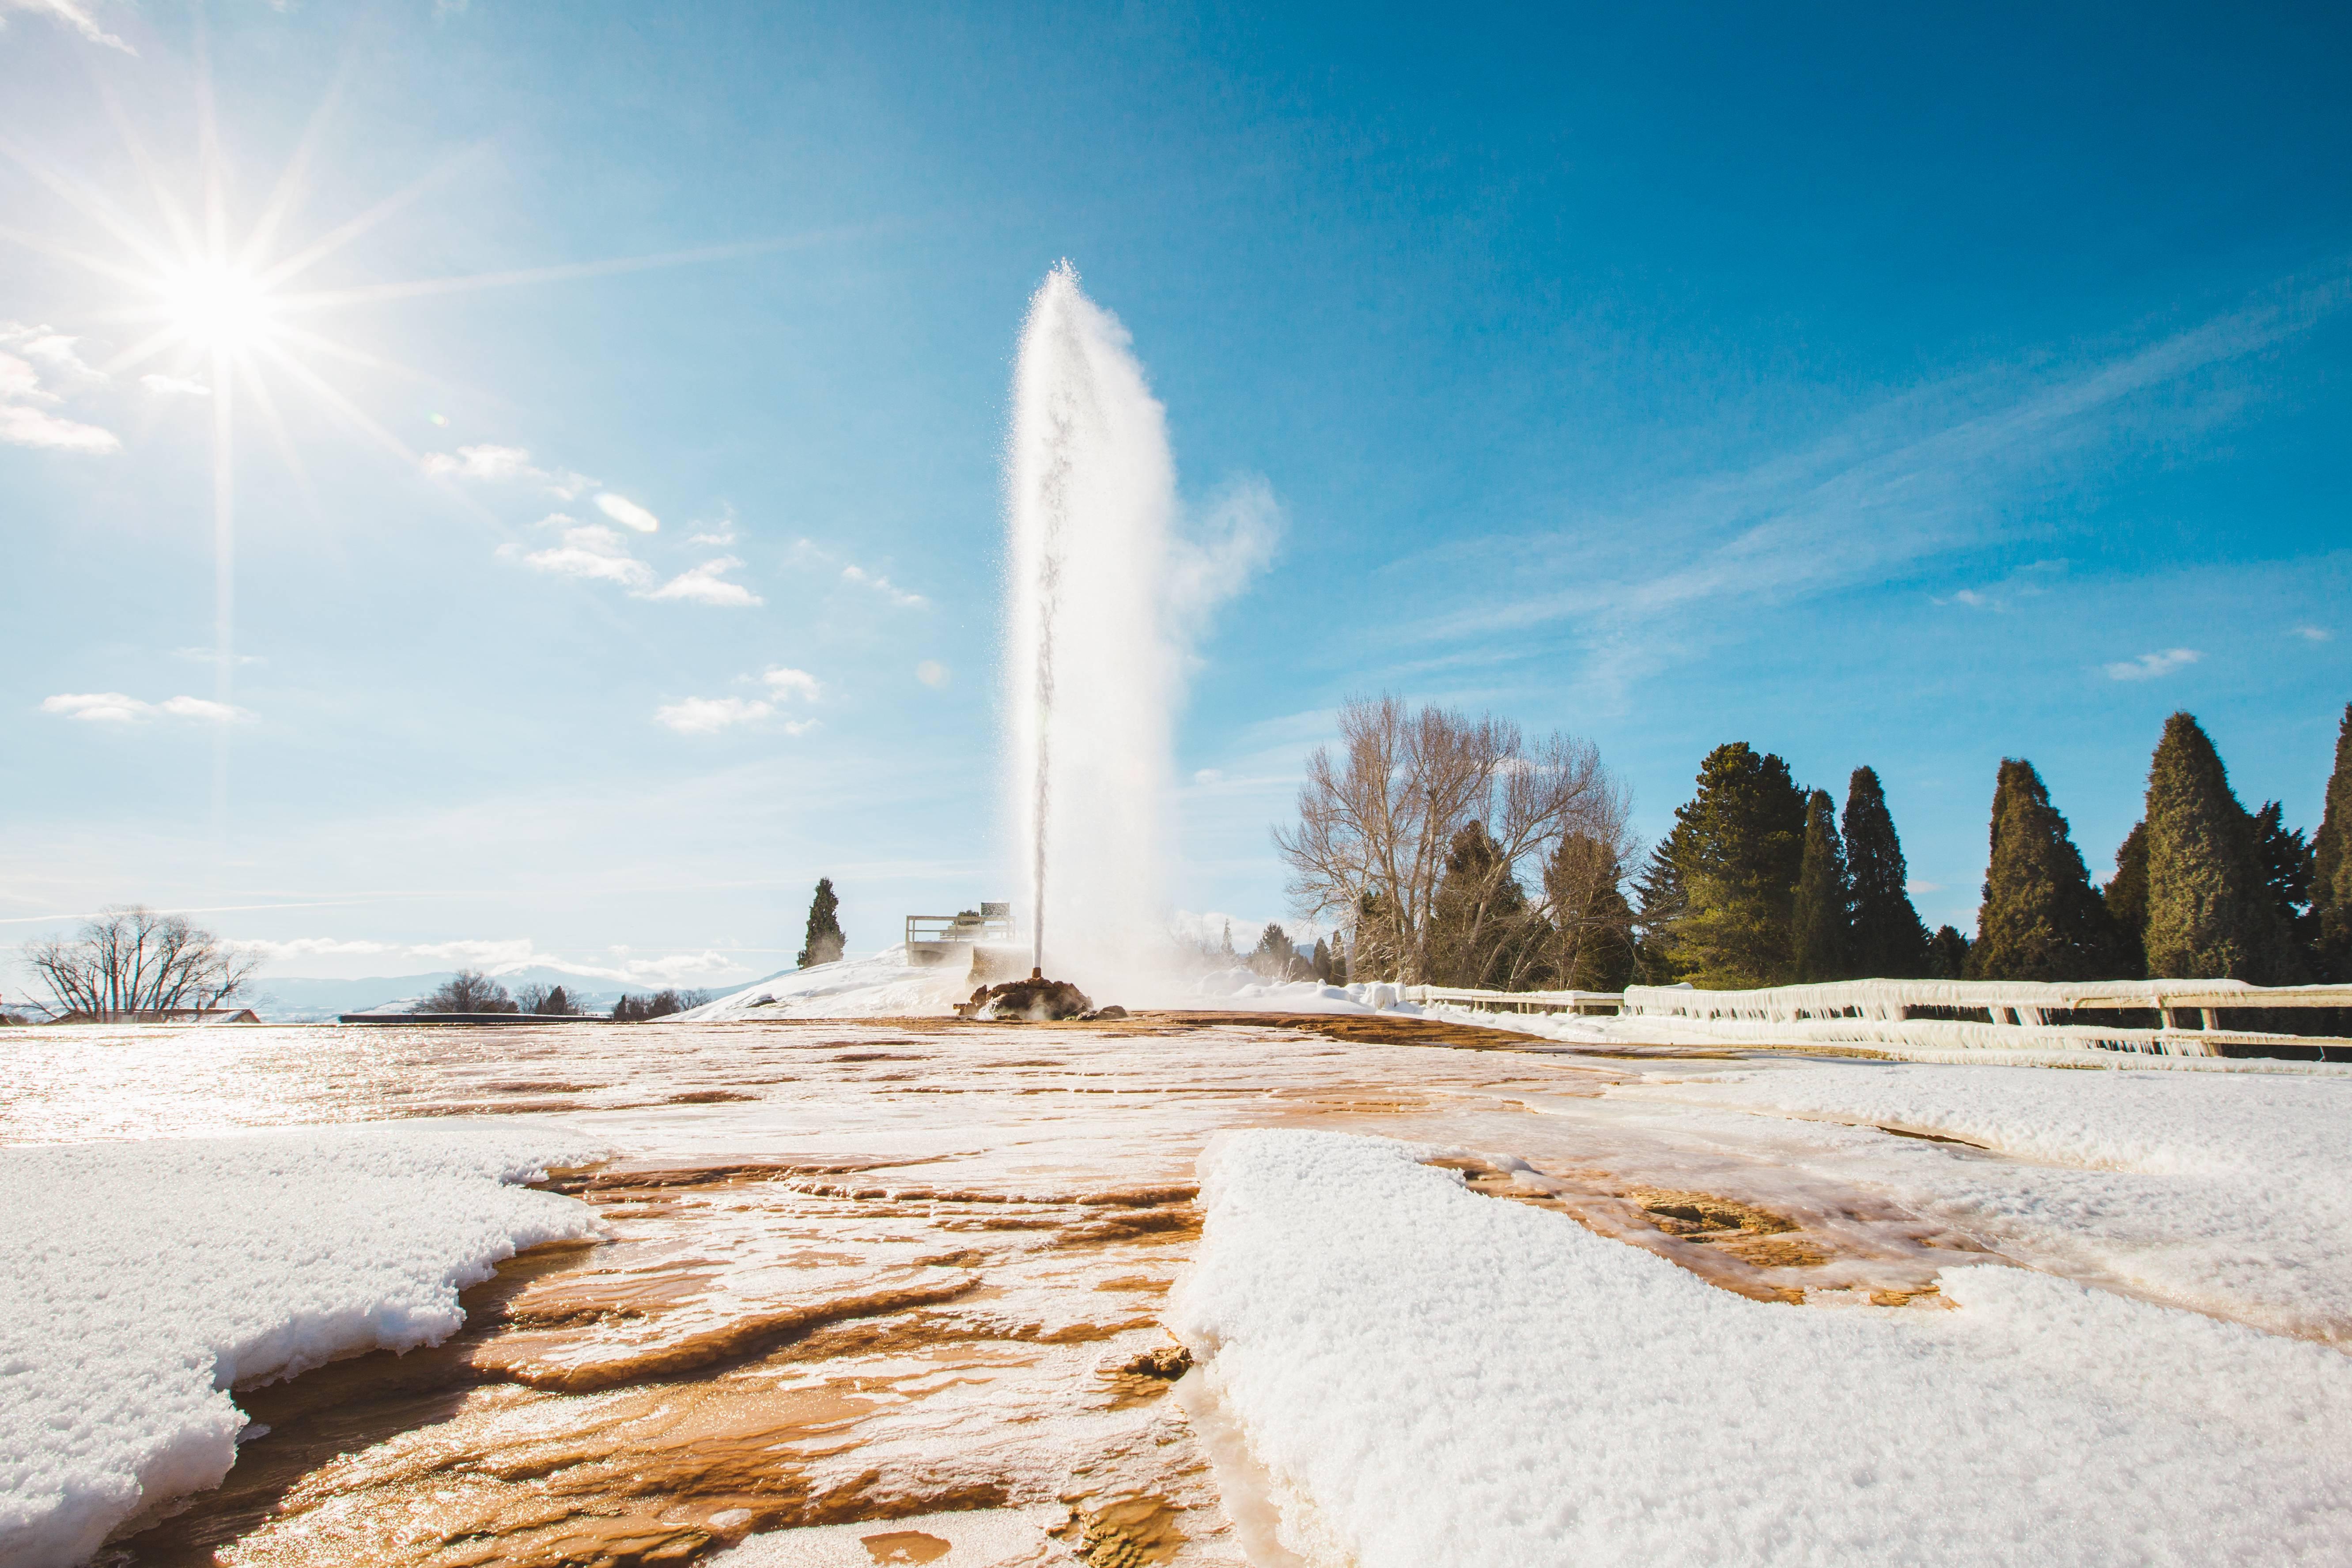 Geyser, Soda Springs. Photo Credit: Idaho Tourism